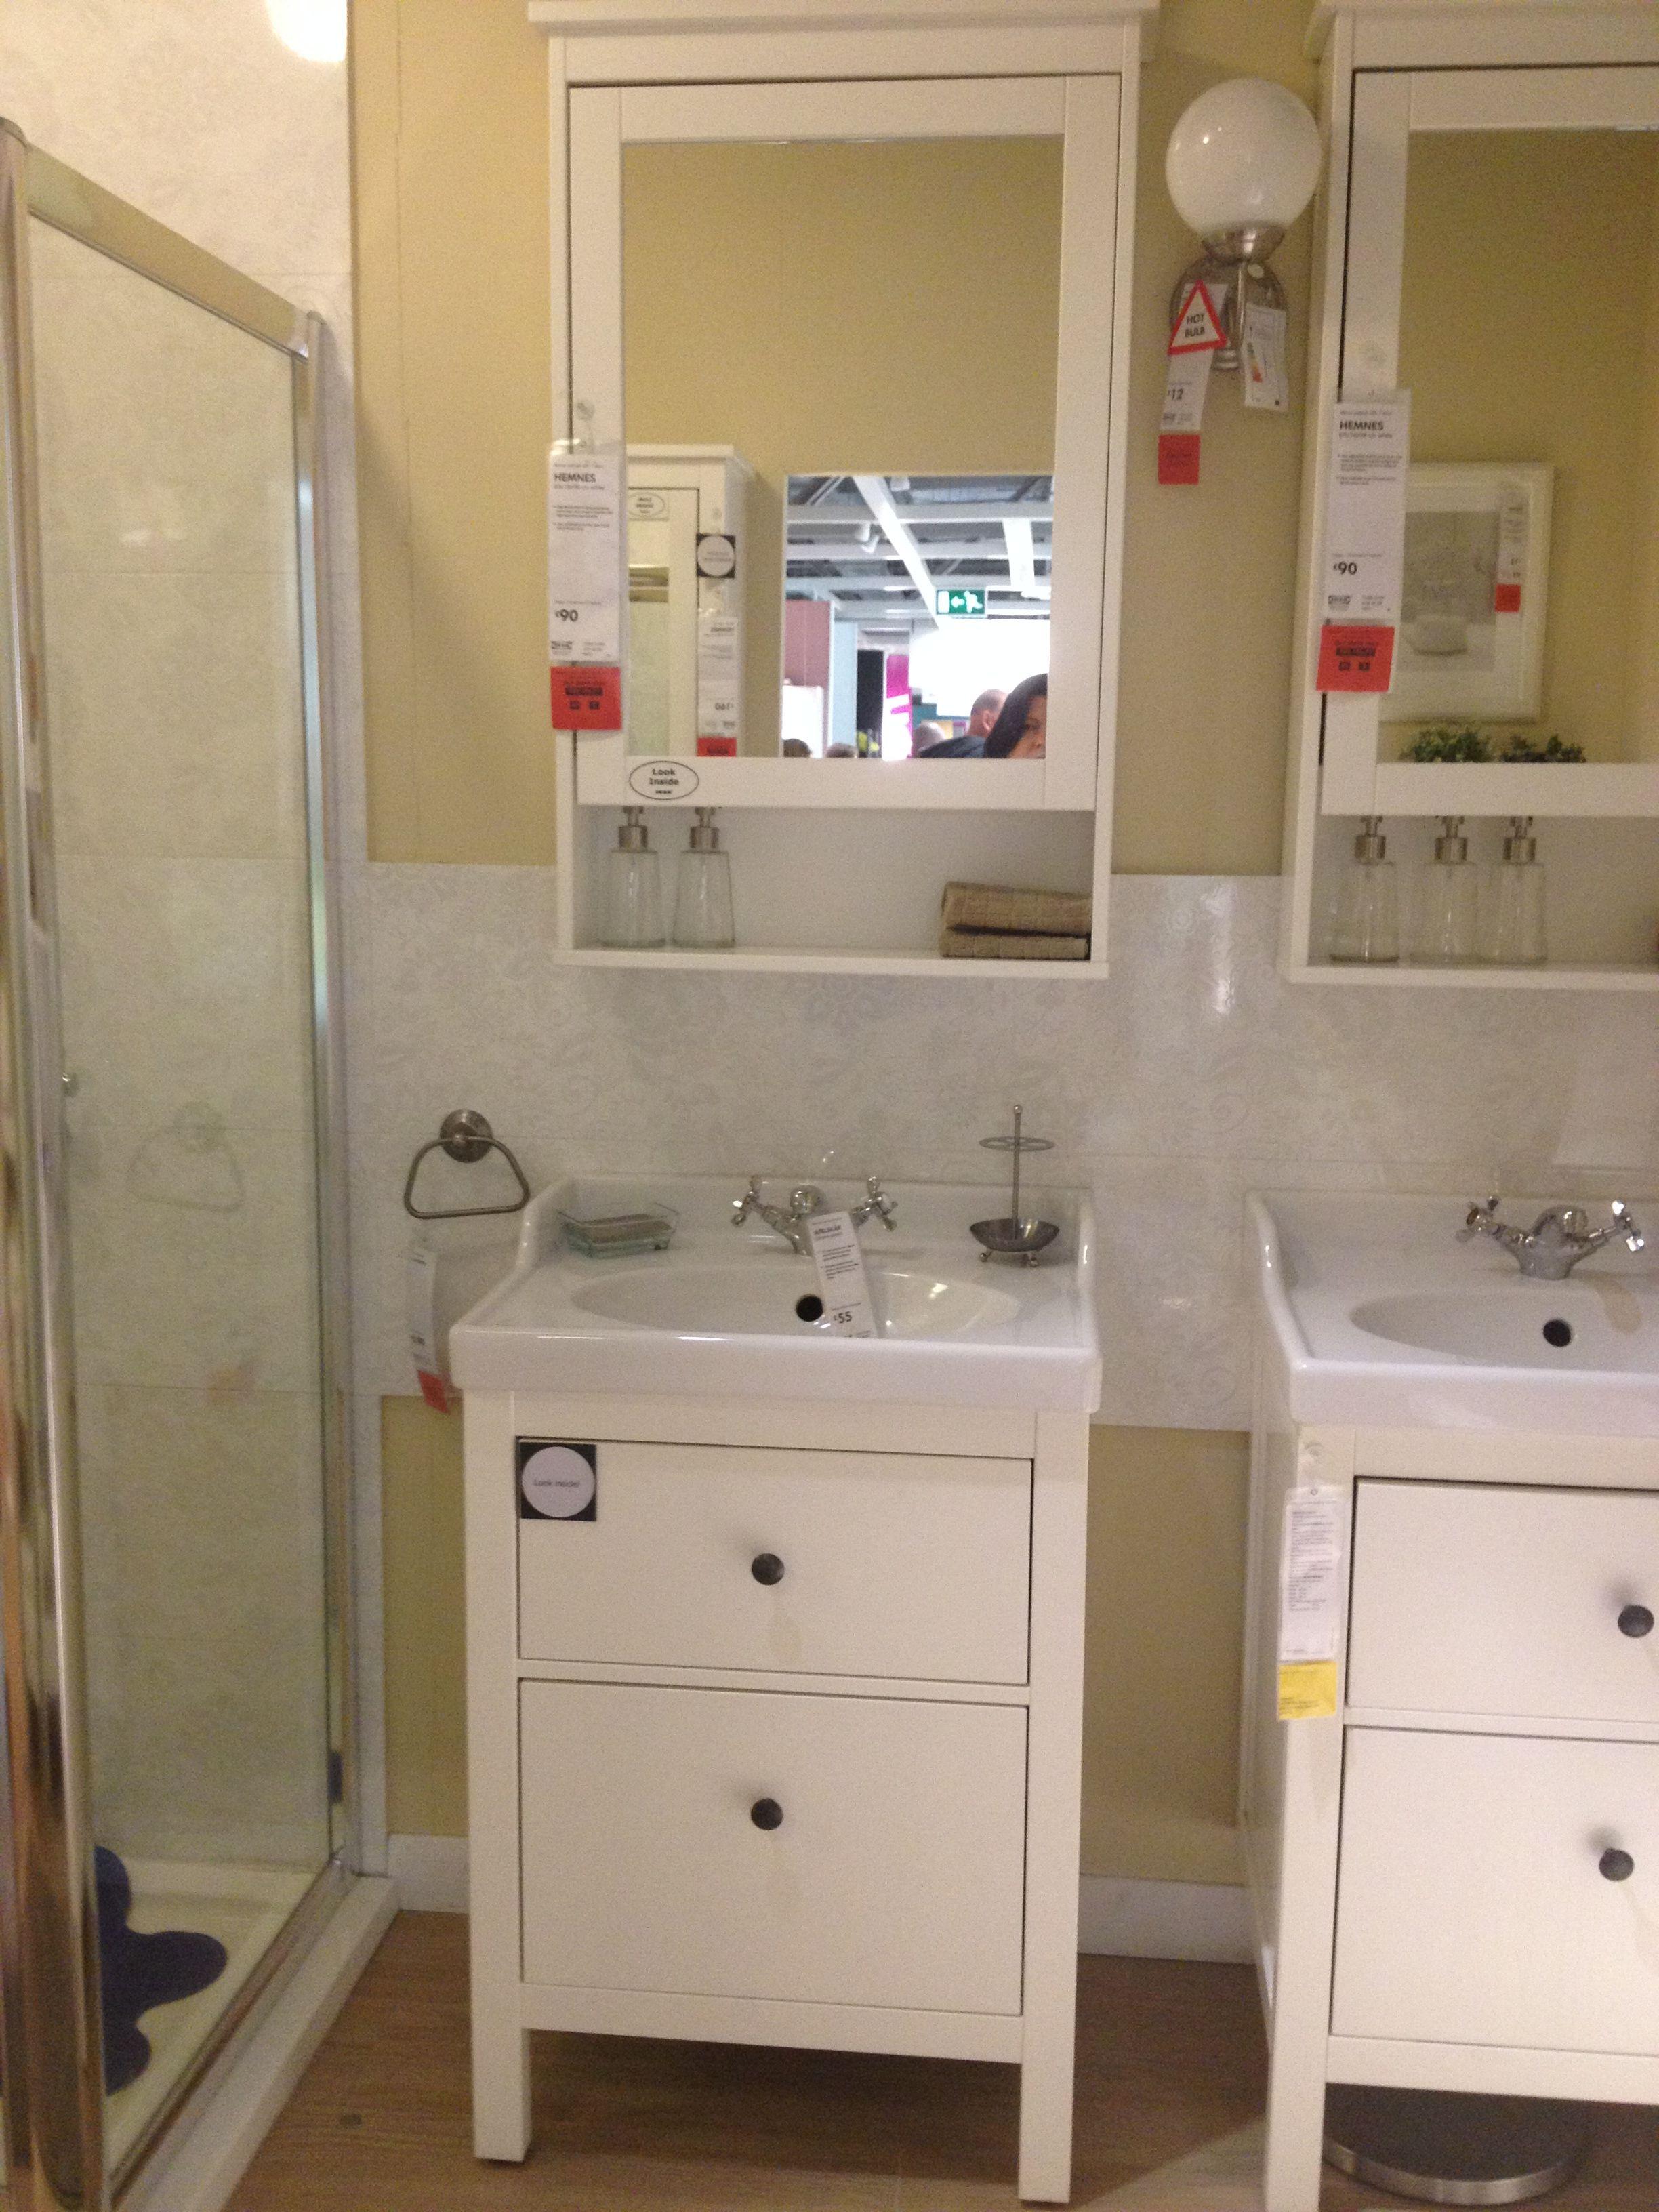 Ikea hemnes washstand salle de bain - Ikea conception salle de bain ...